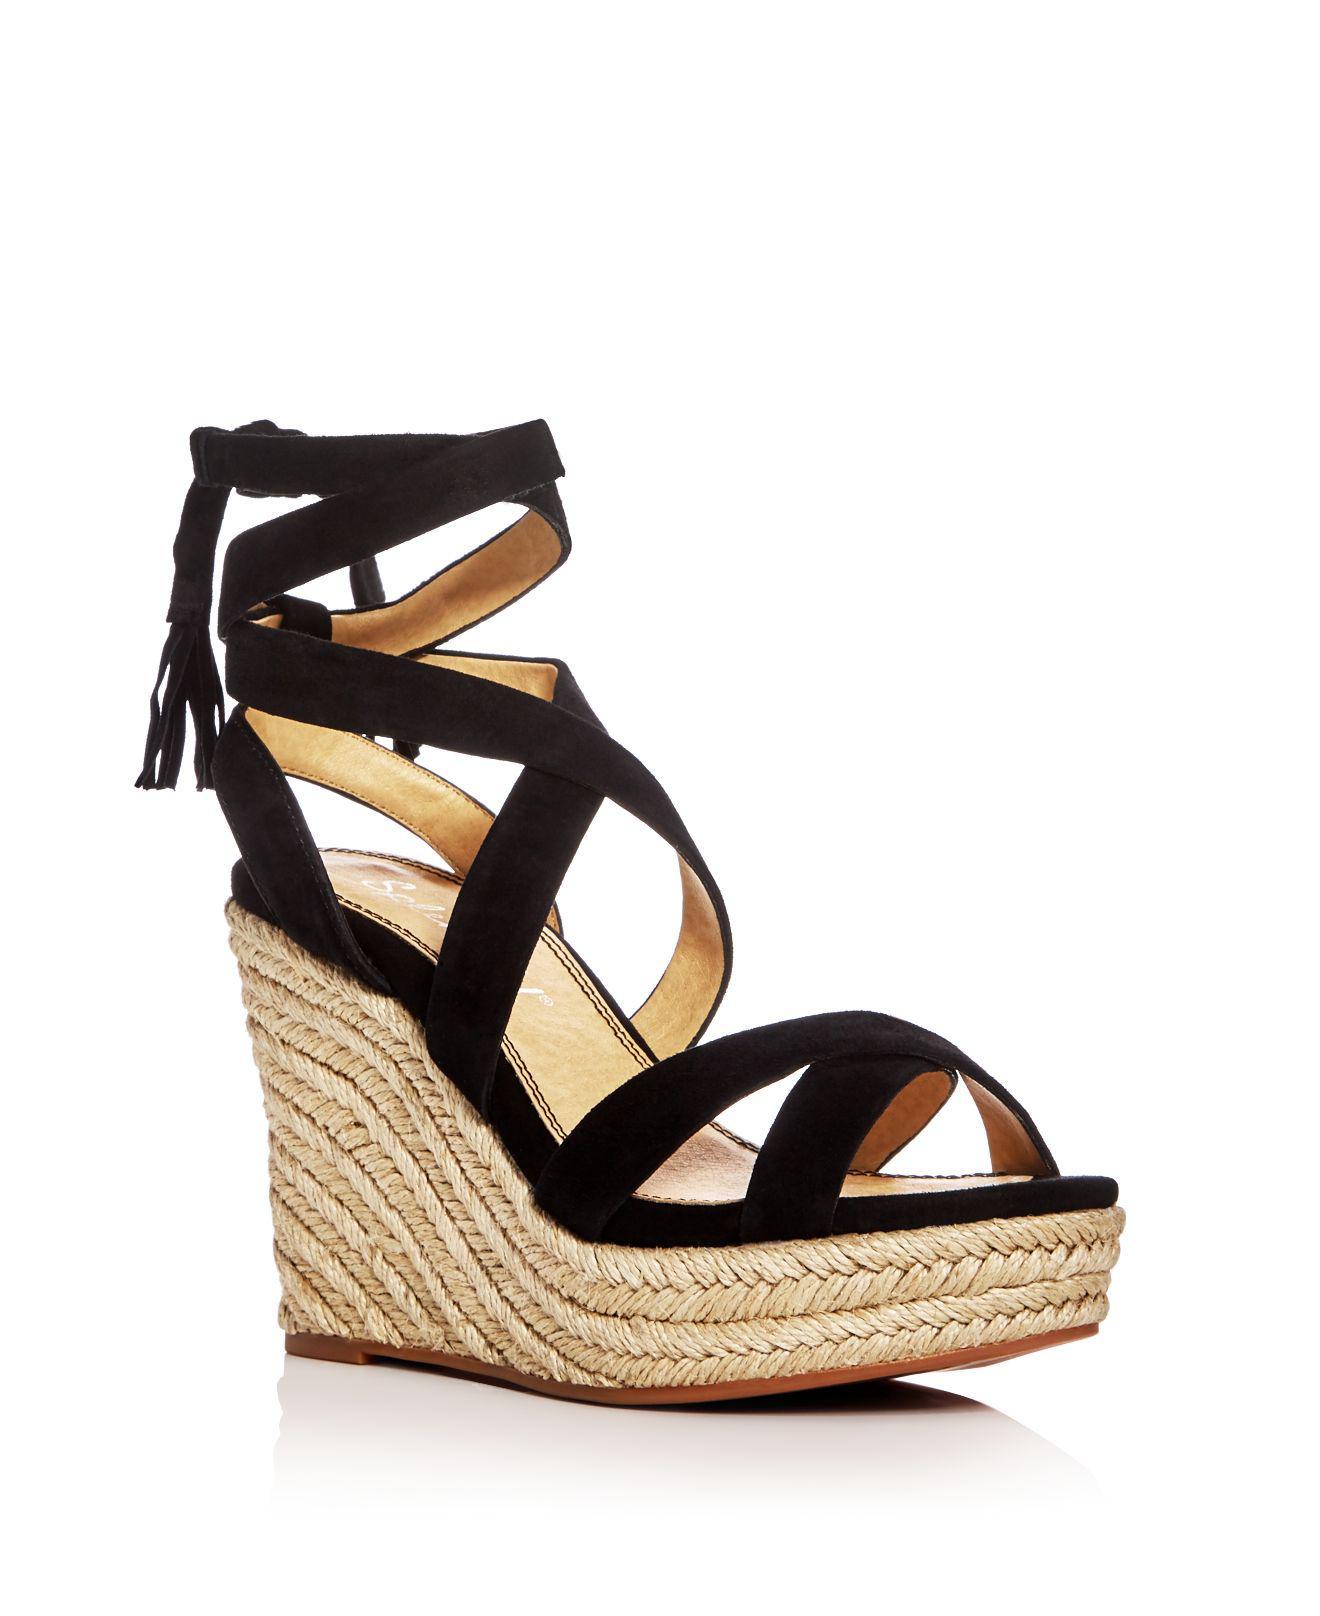 0e09866ec17 Lyst - Splendid Janice Ankle Tie Espadrille Wedge Sandals in Black